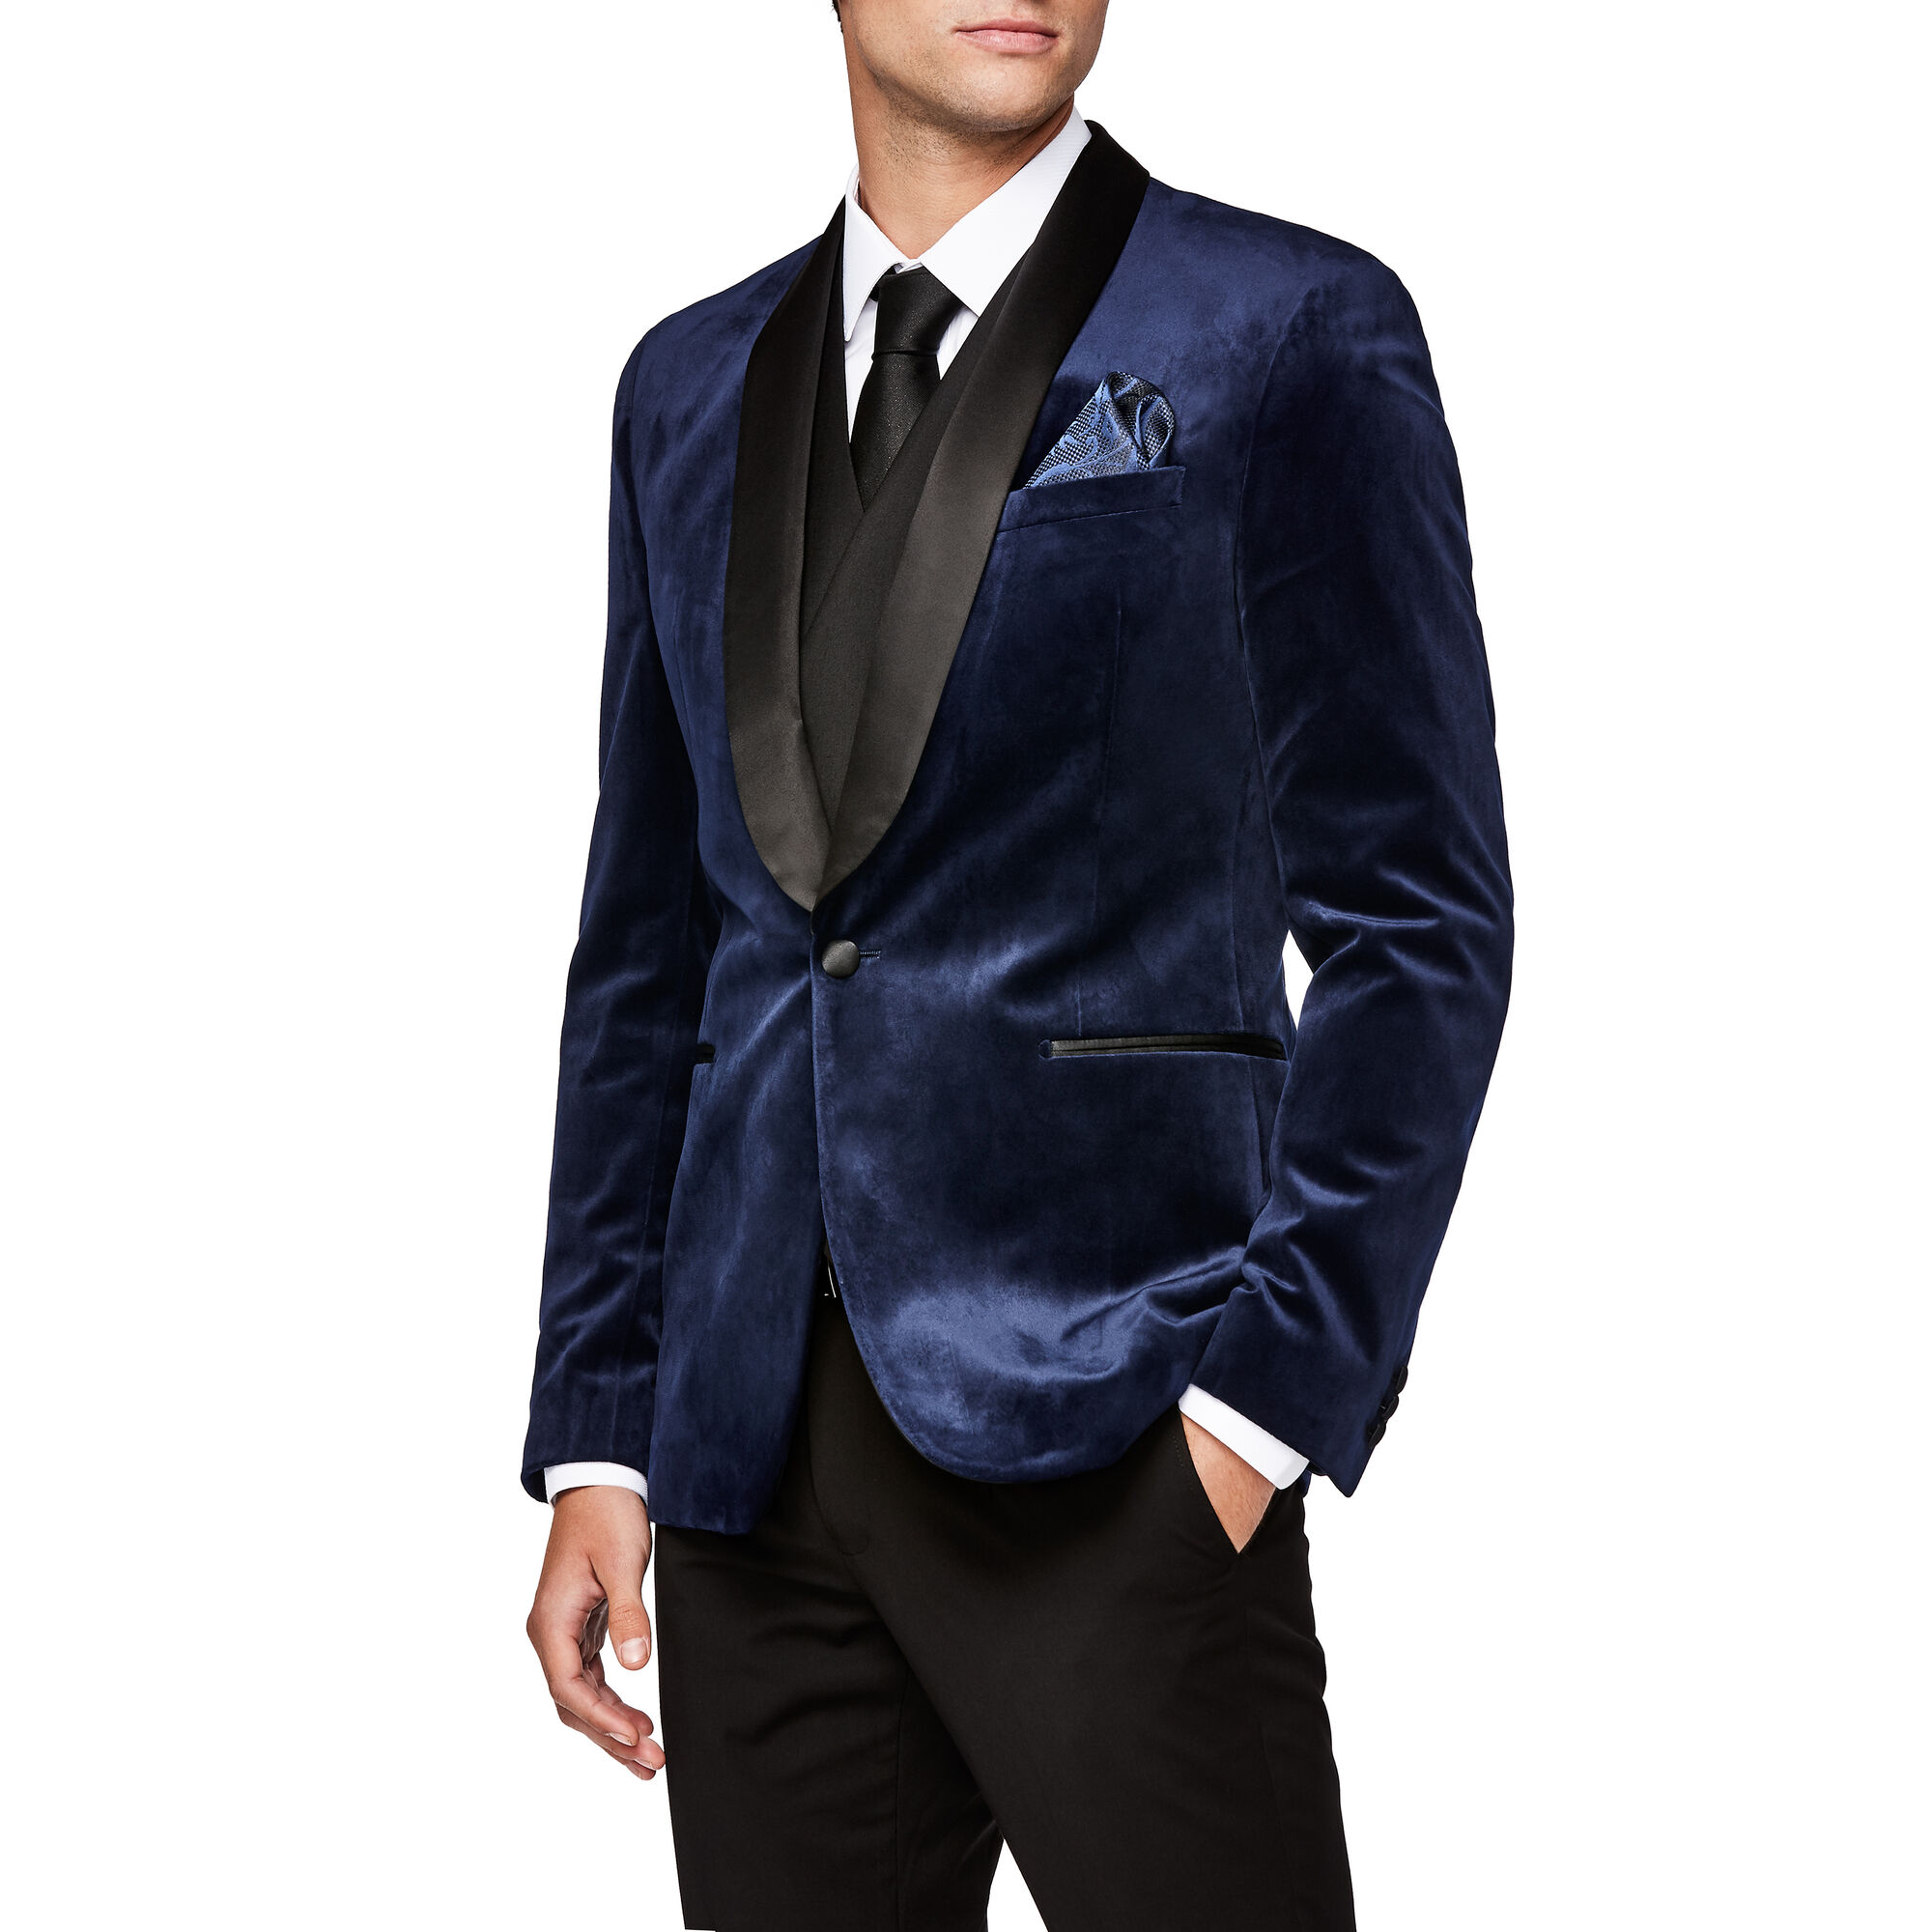 850c373808d5 Demonte - Royal - Navy Slim Tux Velvet Jacket | Politix